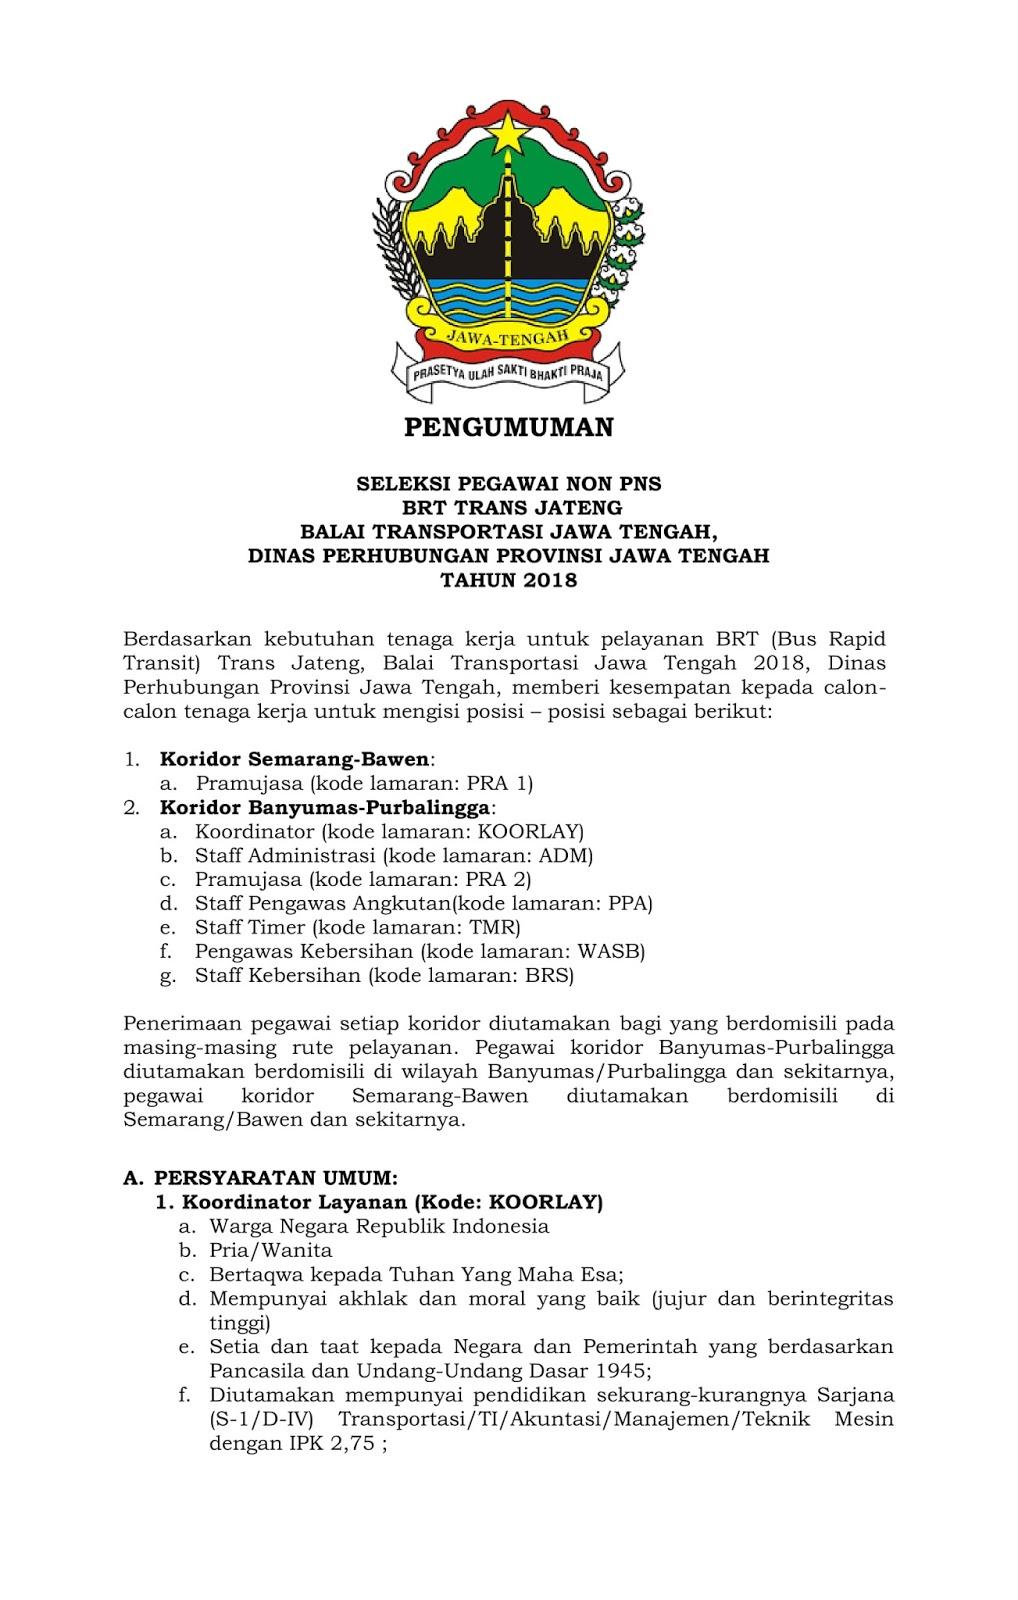 Lowongan Kerja  Rekrutmen Non PNS Dinas Perhubungan Provinsi Jawa Tengah Besar Besaran    Oktober 2018